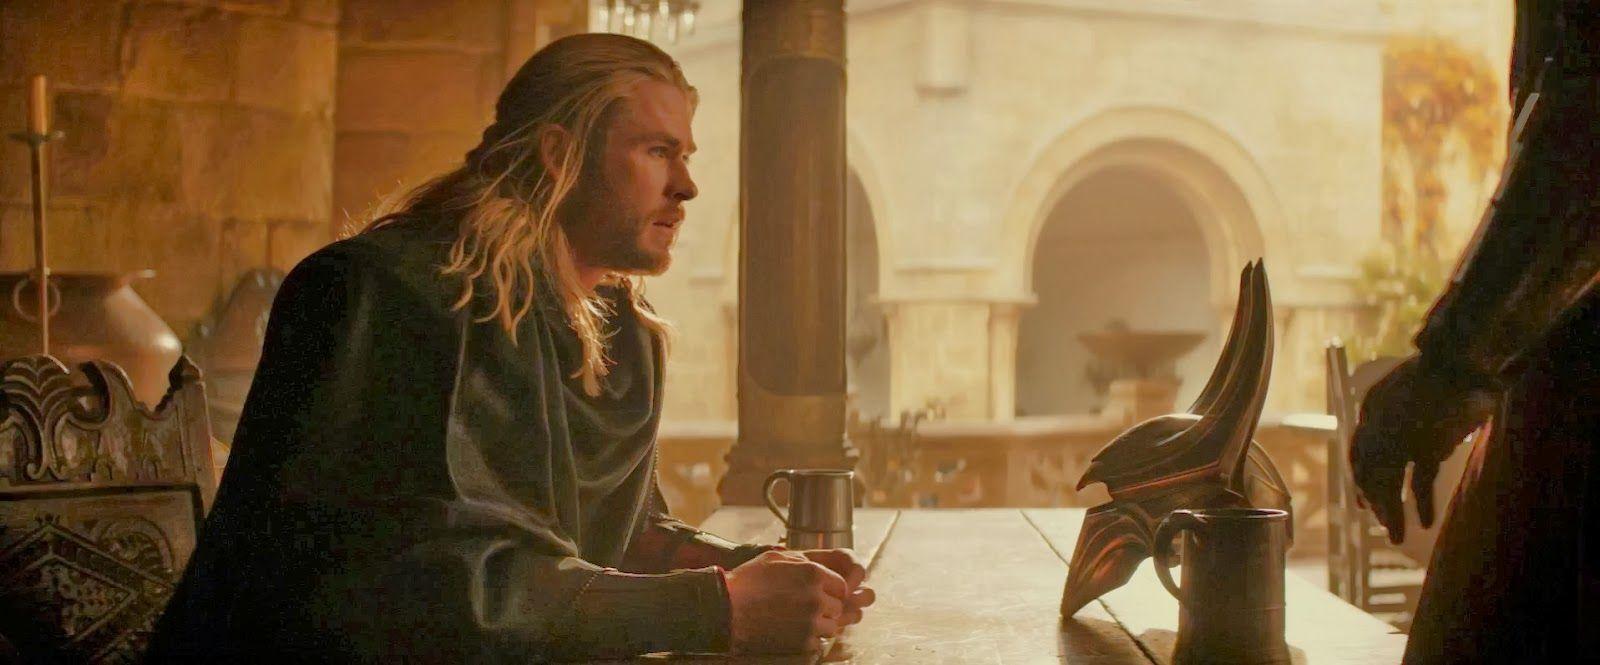 Thor And Jane Fighting Malekith Hd Pelis Mega Hd 1080p 720p  -> Pelismegahd